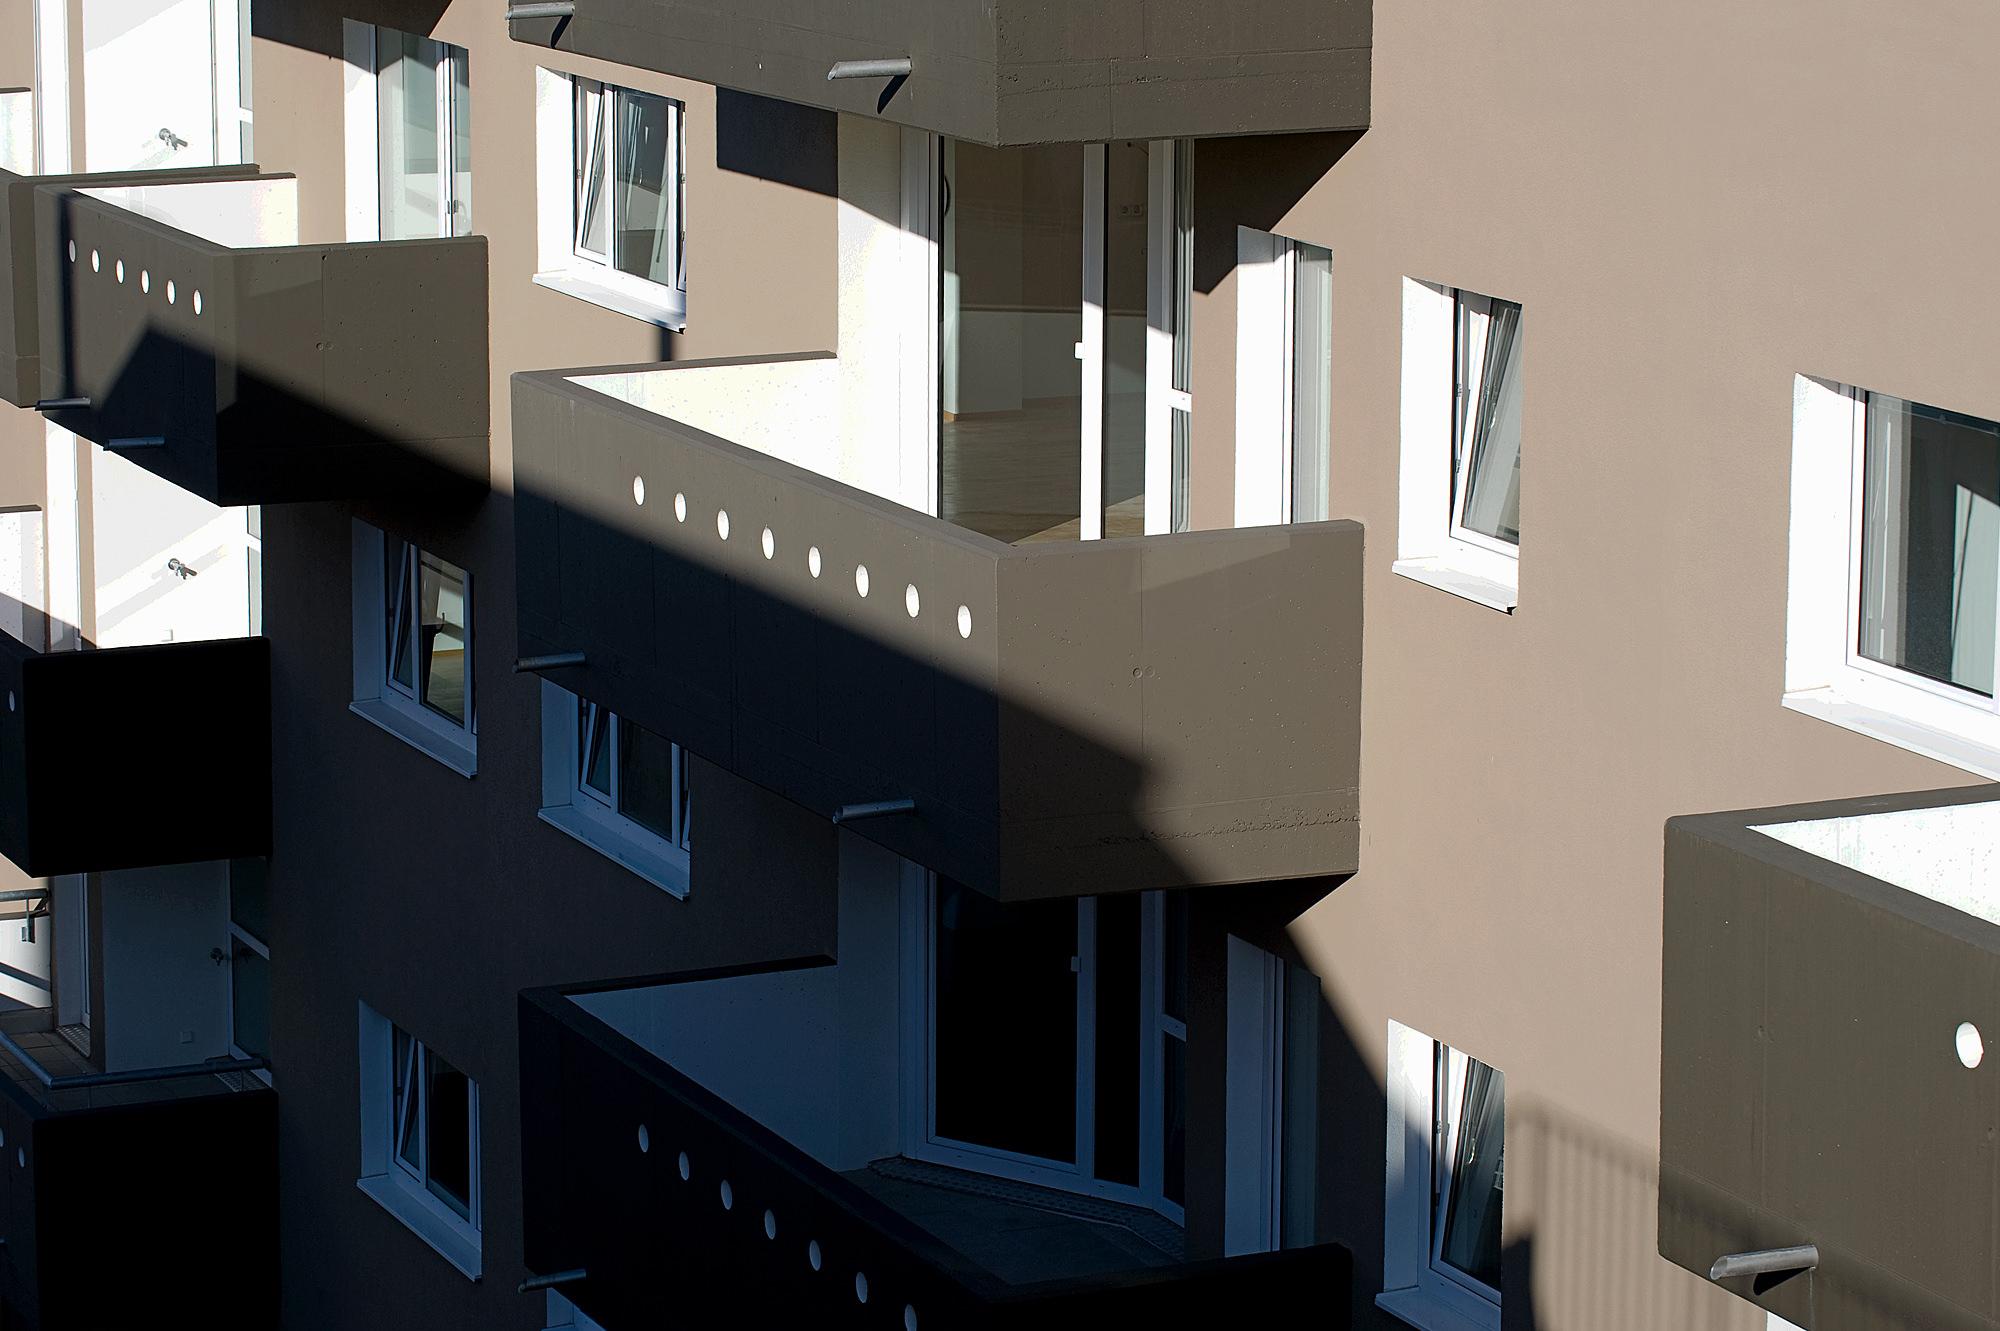 moselgasse 04 wohnbau 1100 wien junger beer architektur